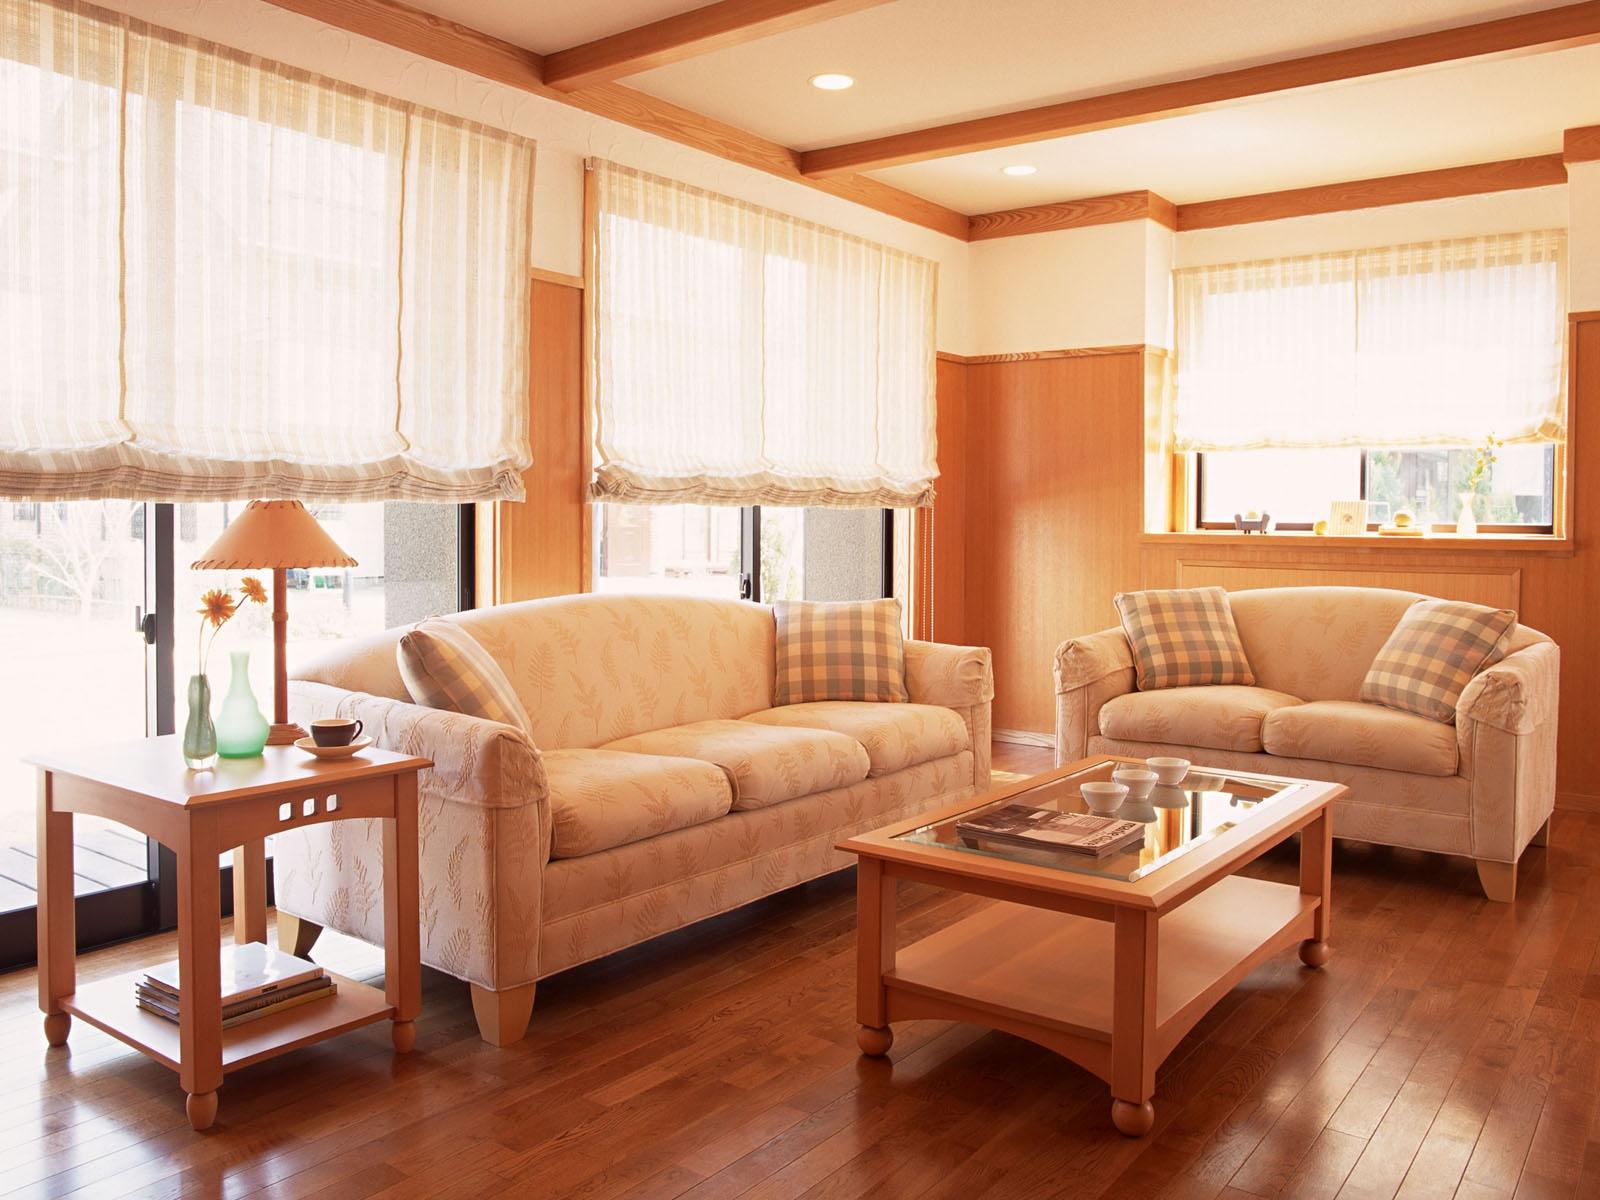 Innenarchitektur Holz hintergrundbilder zimmer innere bett holz sessel schlafzimmer